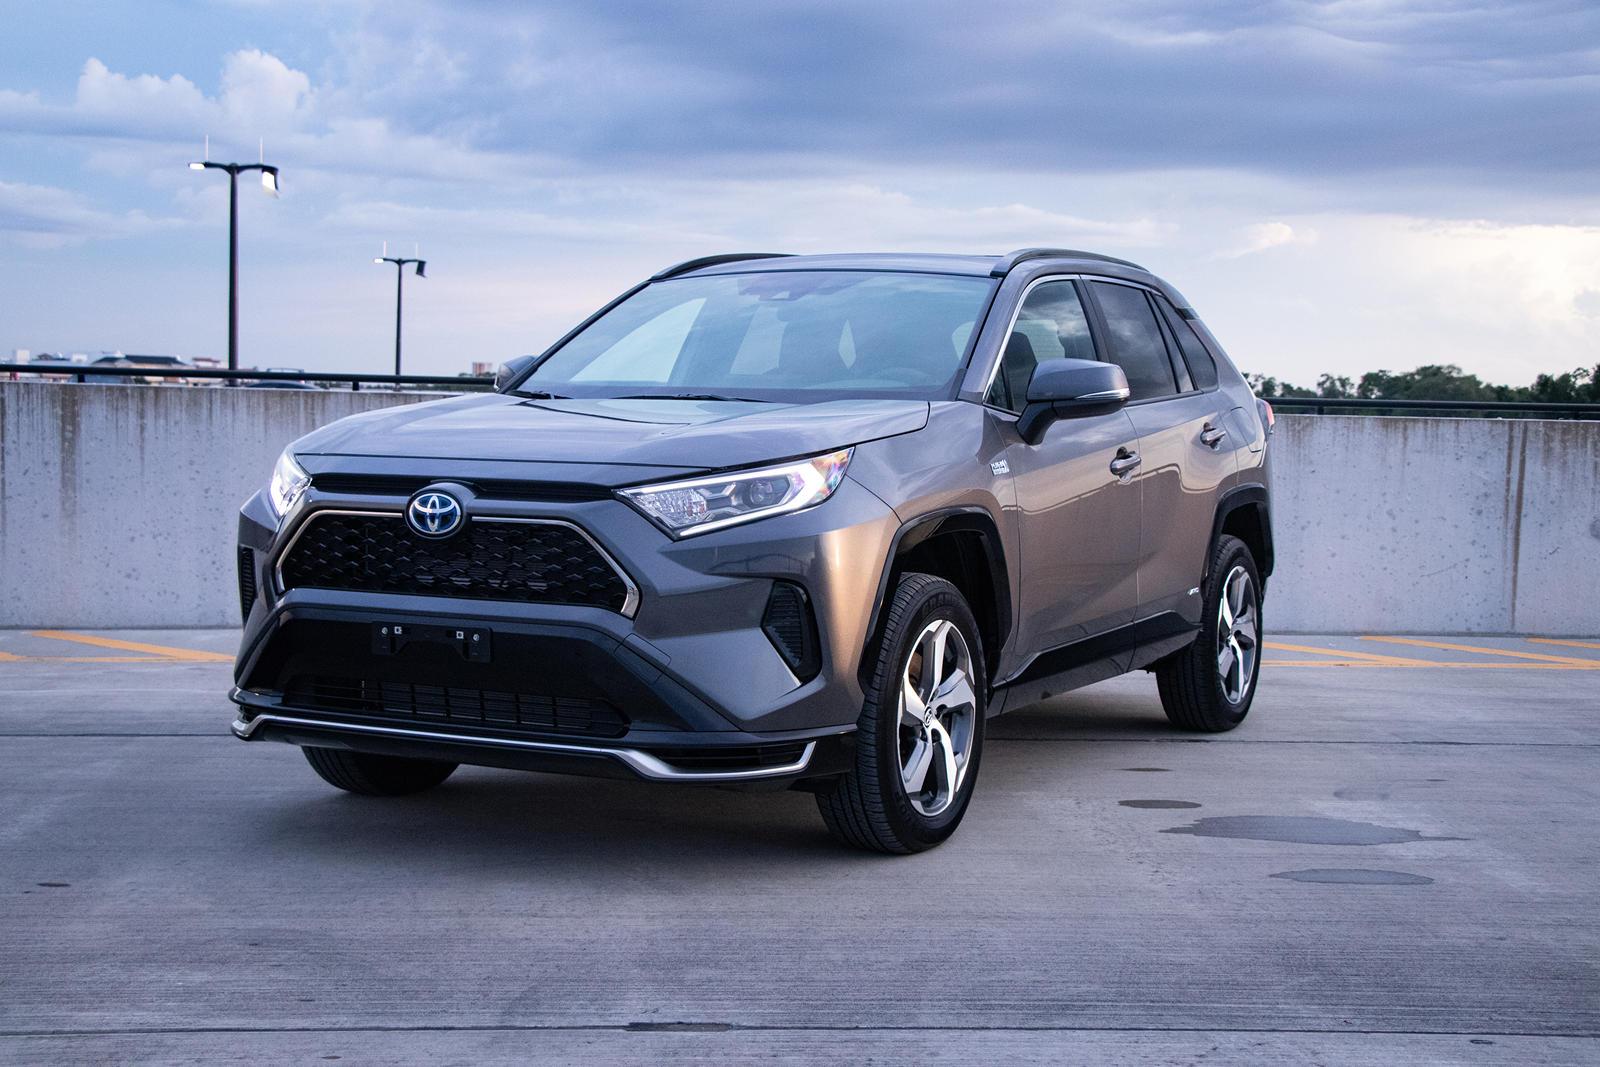 2021 toyota rav4 prime: review, trims, specs, price, new